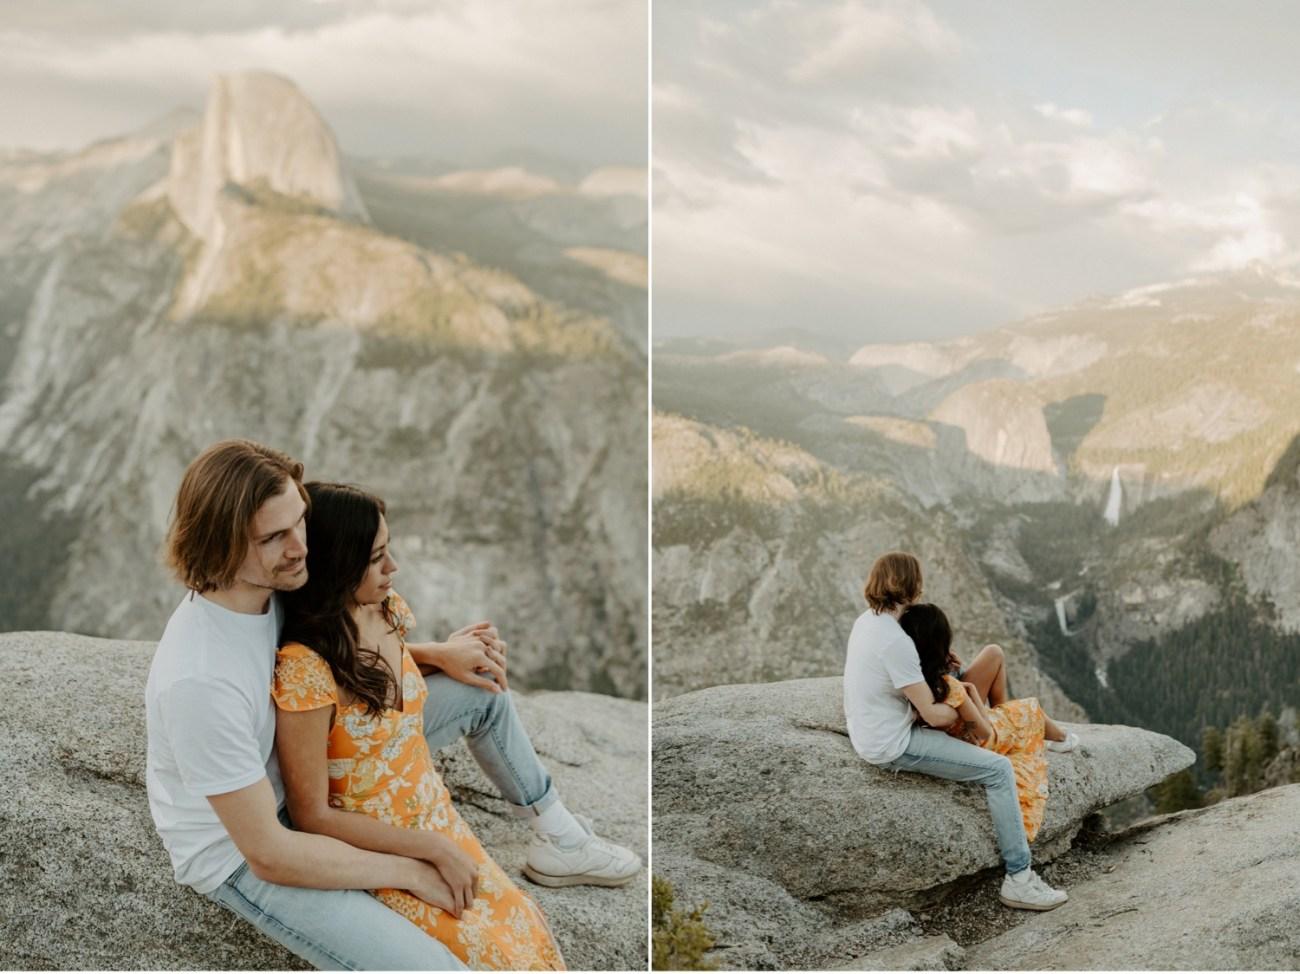 Sunset Yosemite Glacier Point Engagement Session Anais Possamai Photography 22